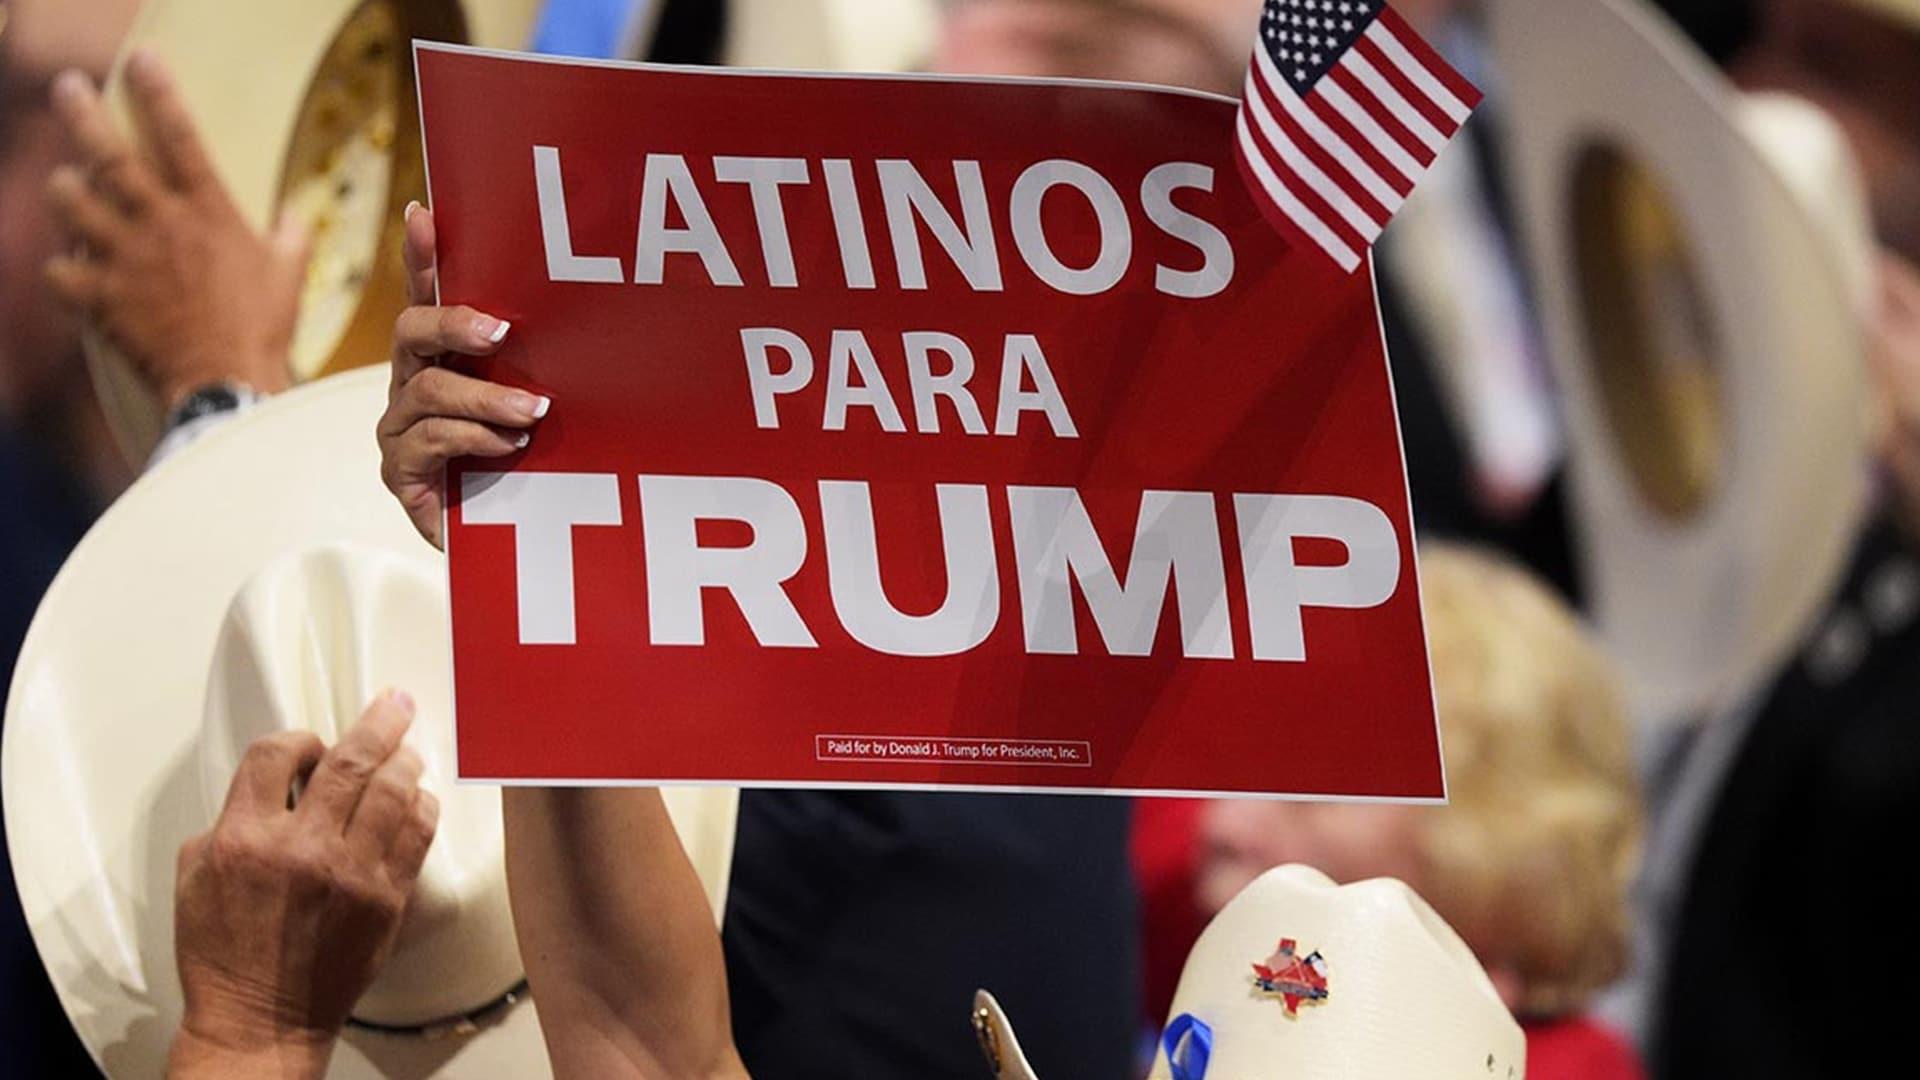 Trump Latino